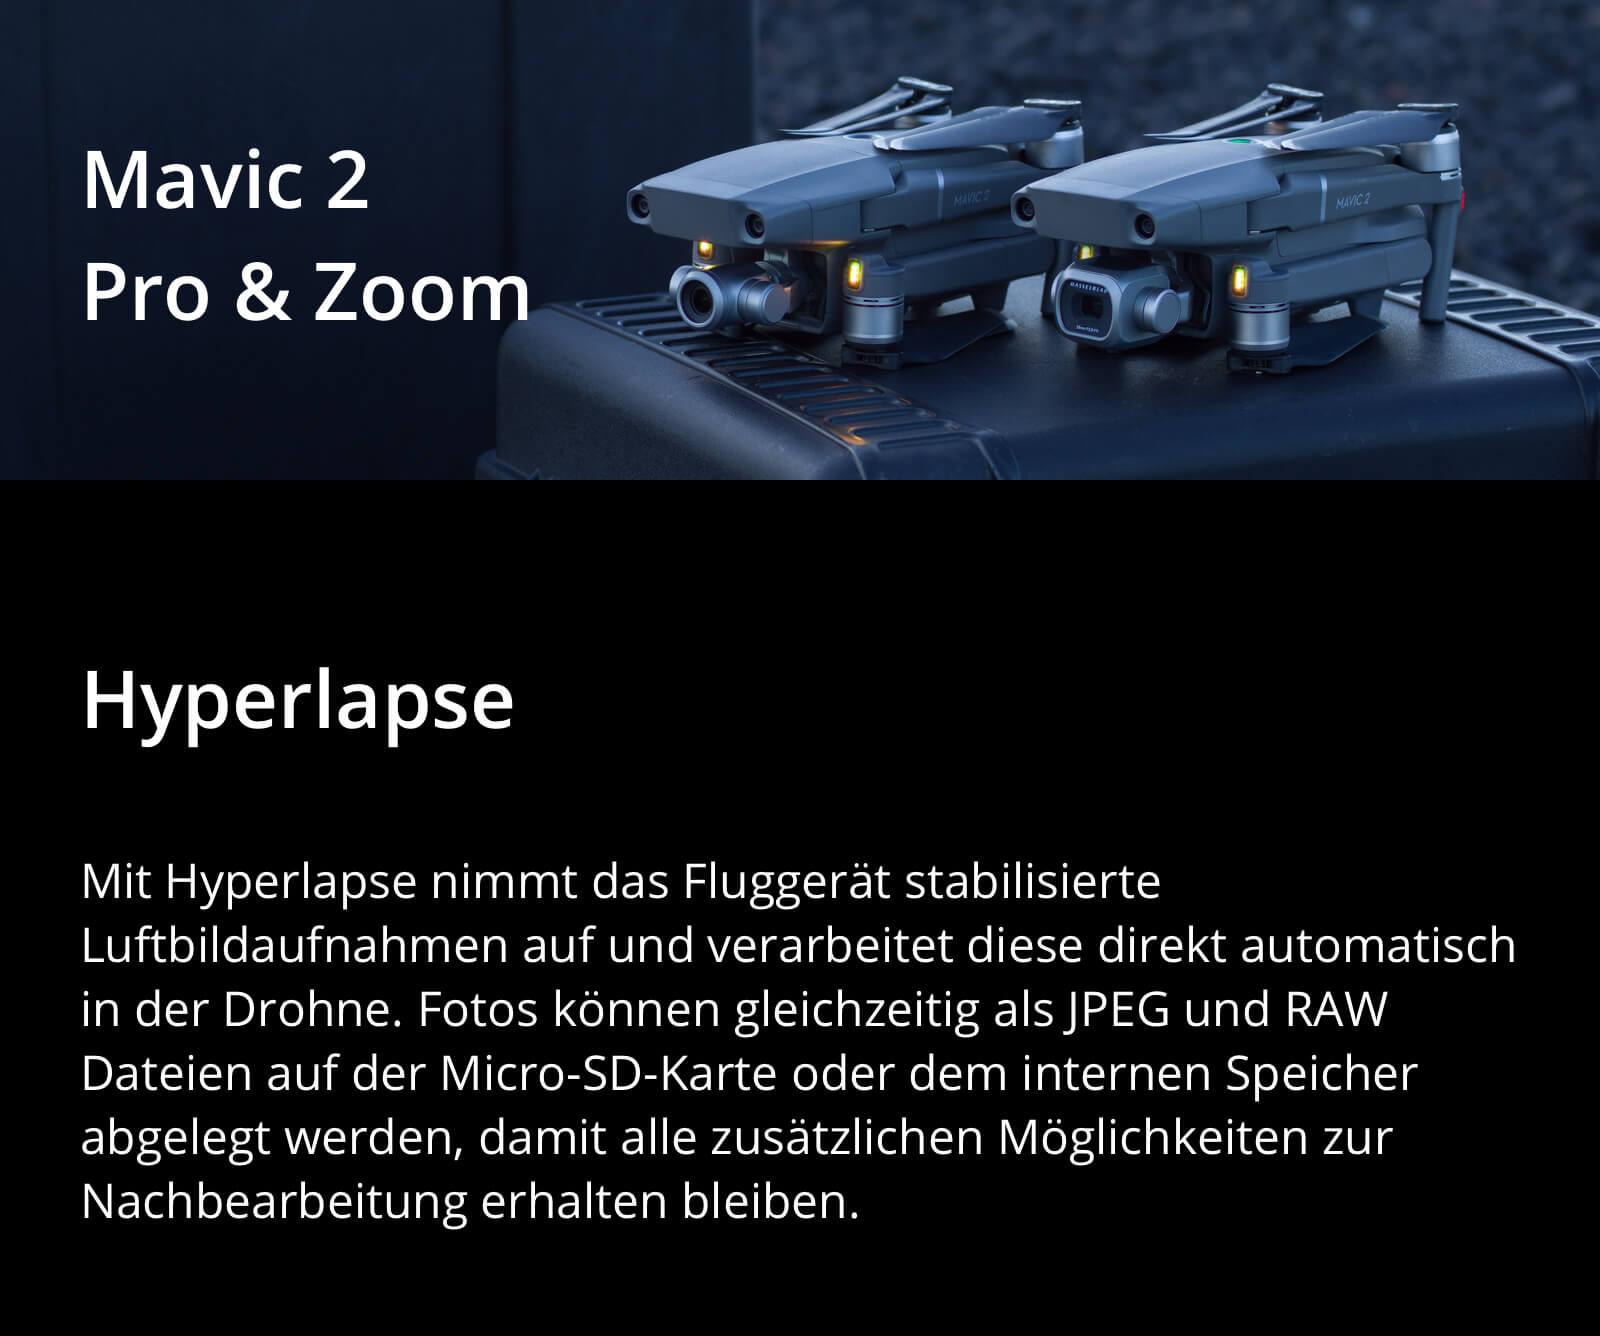 dji-mavic-2-inlay-8Gf8Xp9hKxd8wx